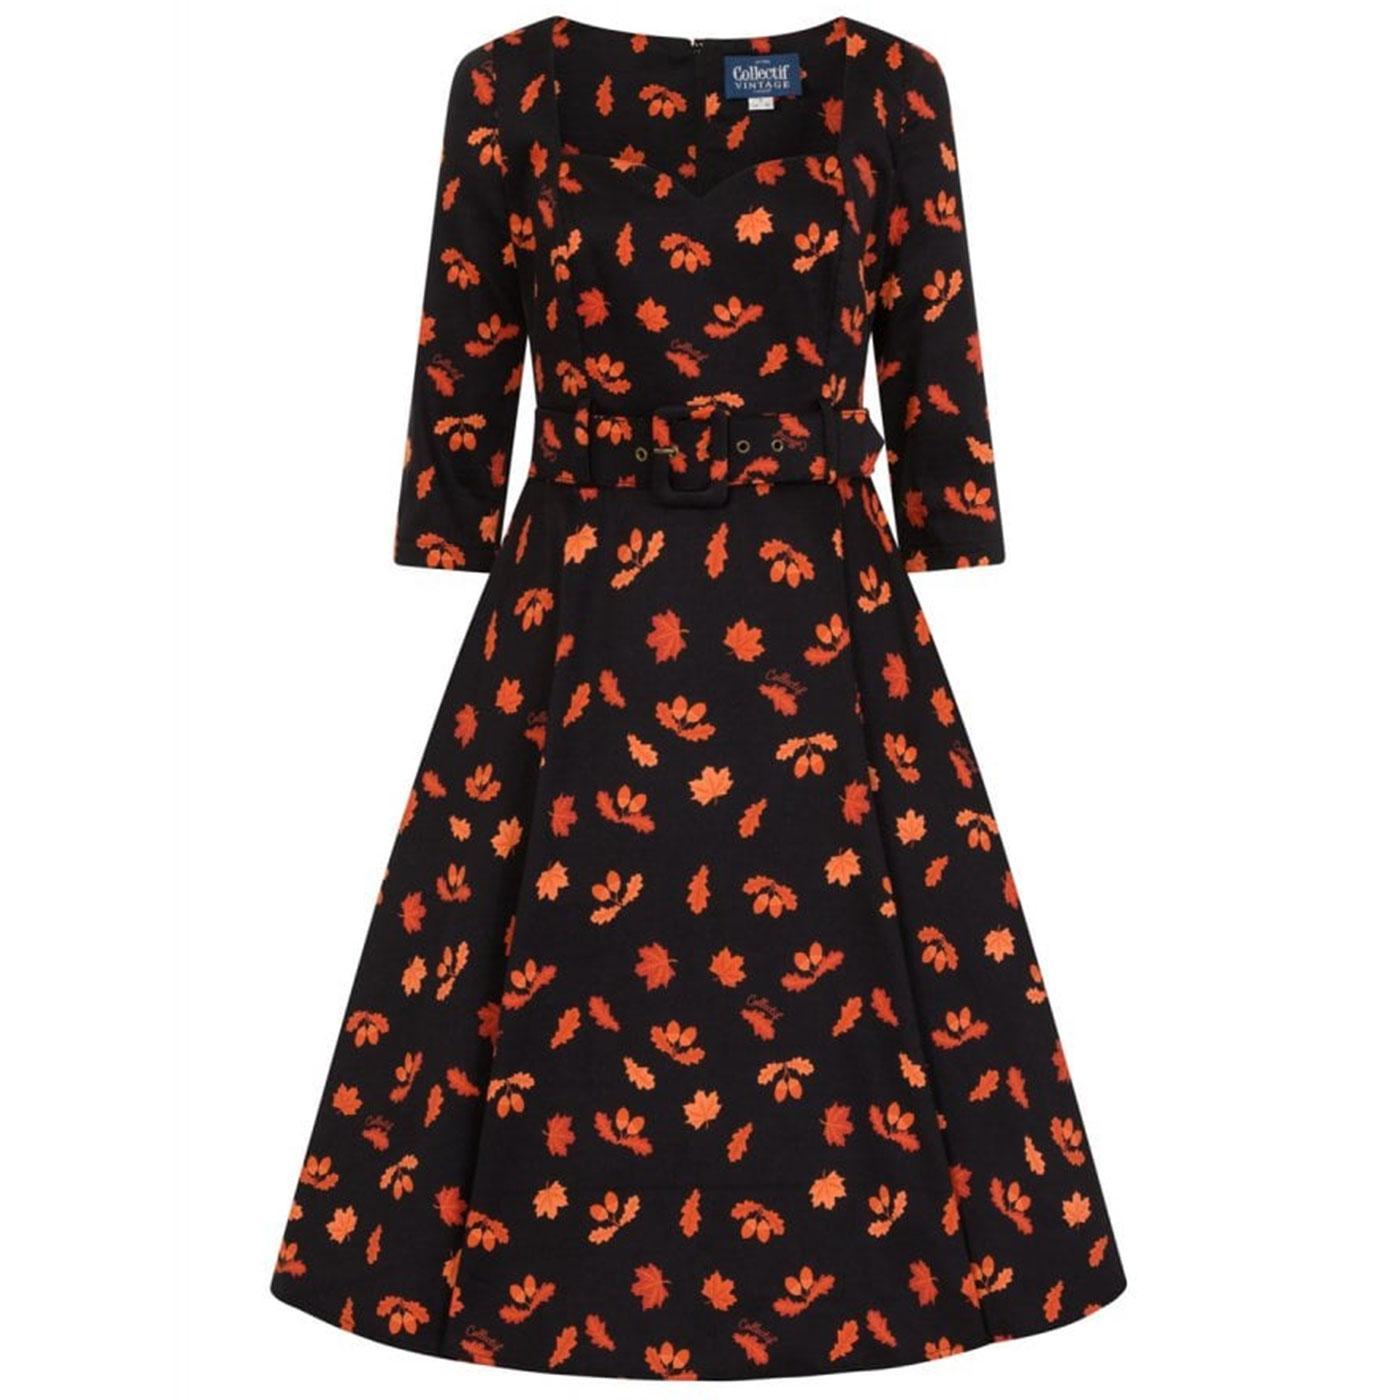 Eliana COLLECTIF Retro 50s Acorn Print Swing Dress